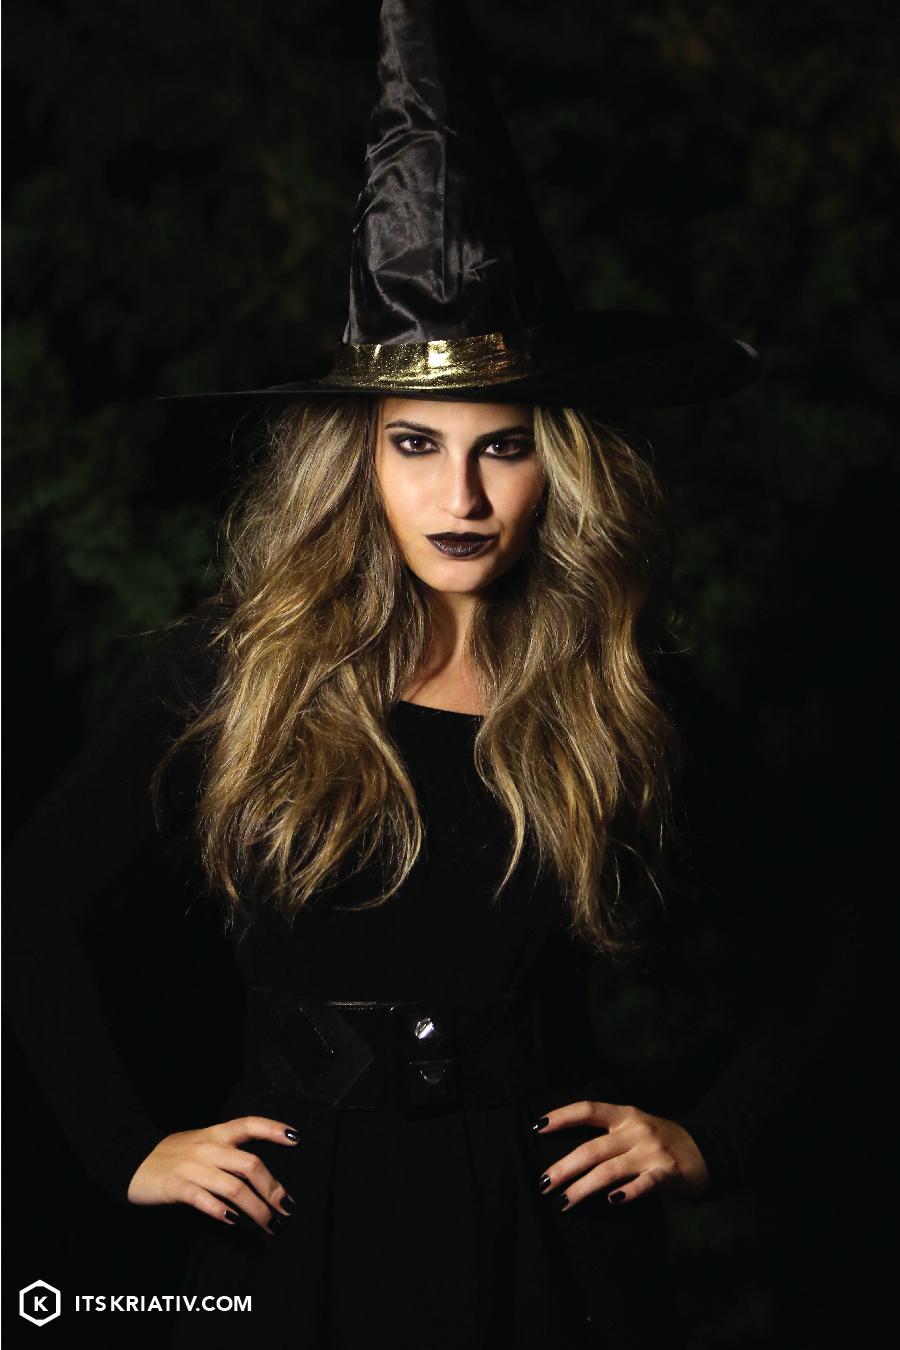 Oct_13_Fashion-Halloween-Witch-01a-01.jpg